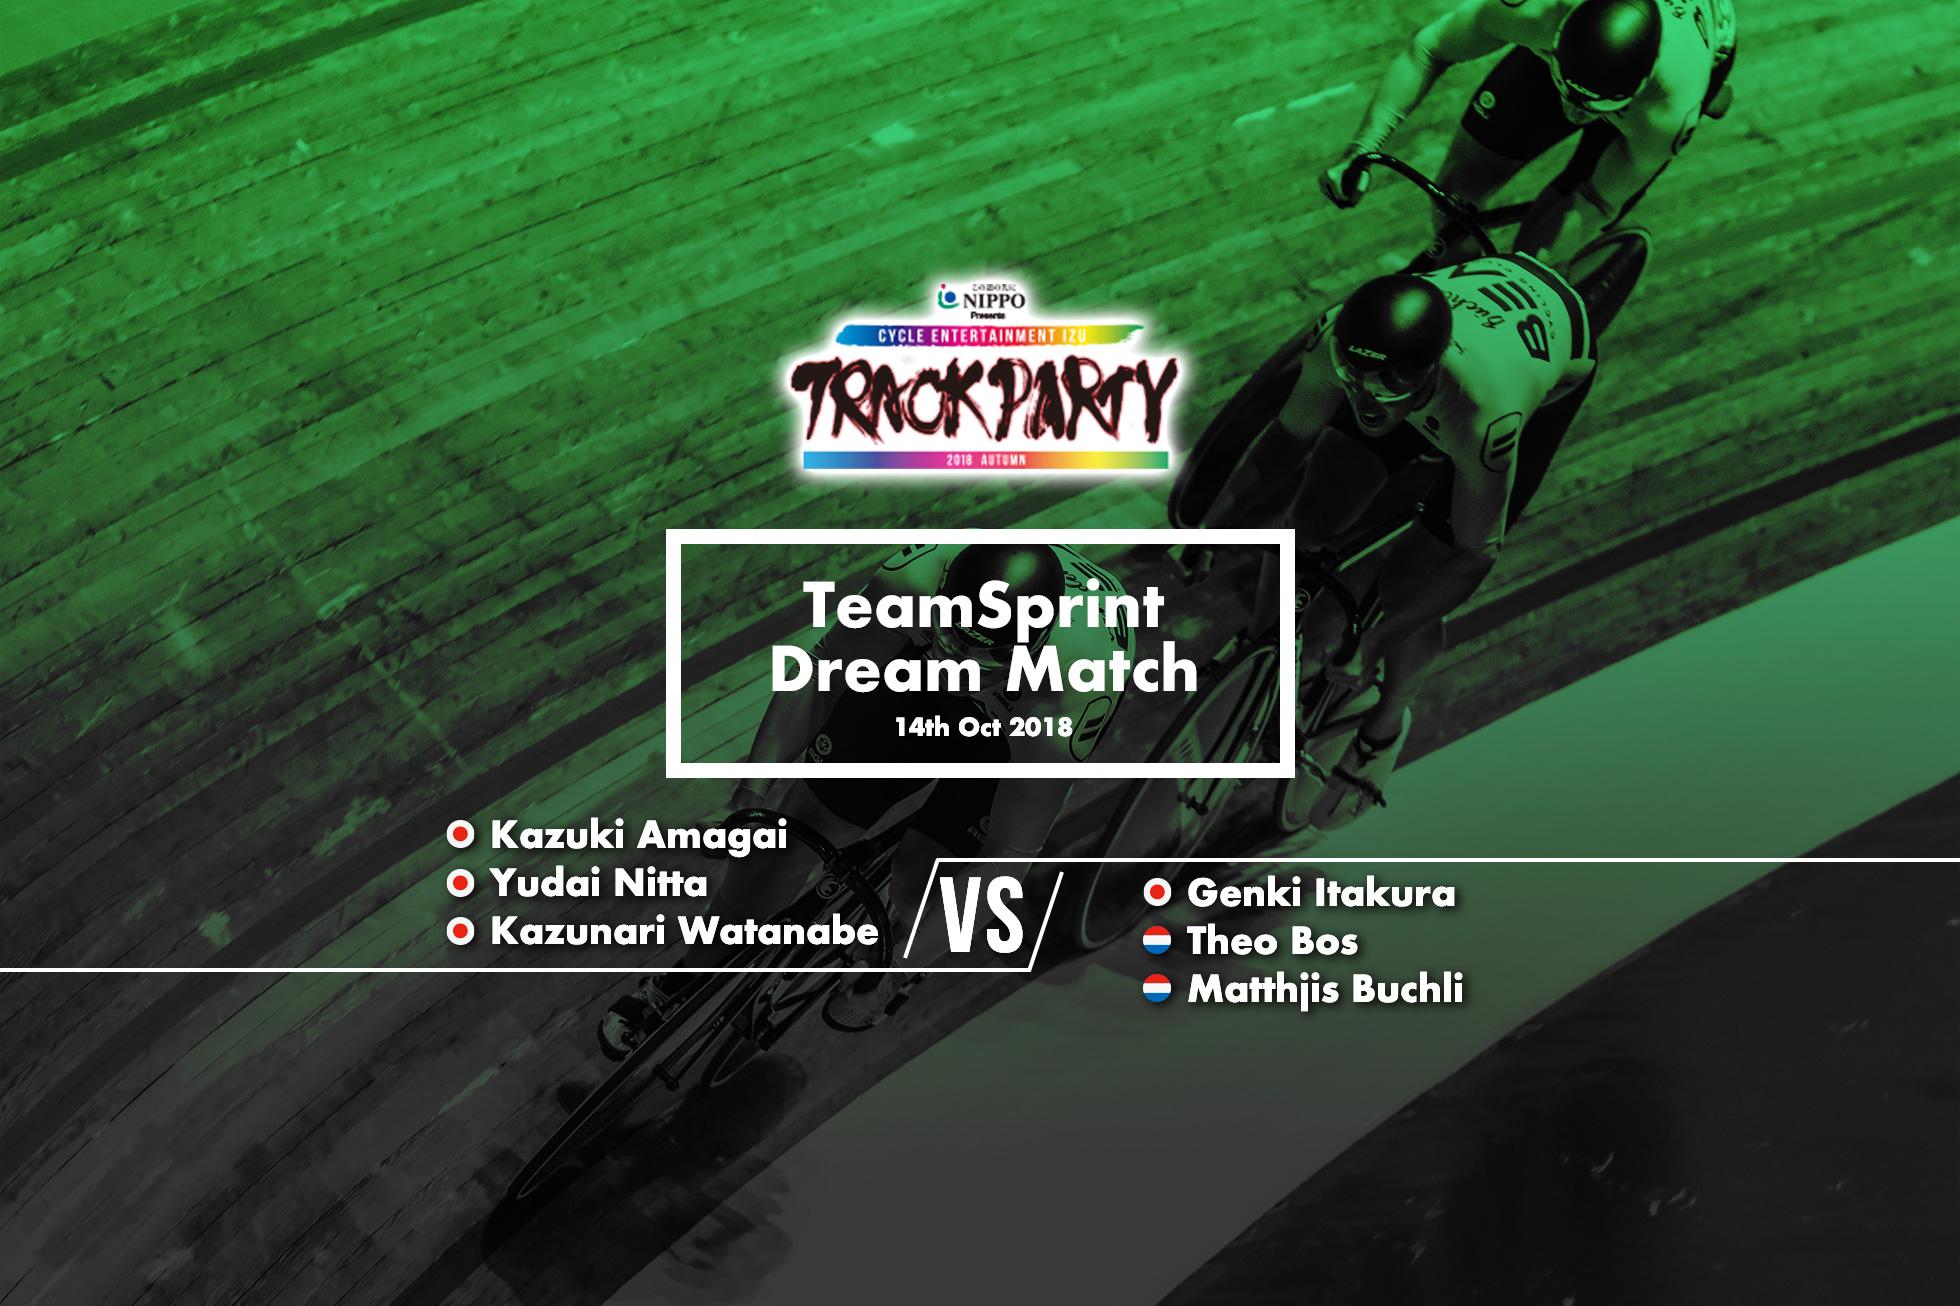 Team Sprint Dream Match